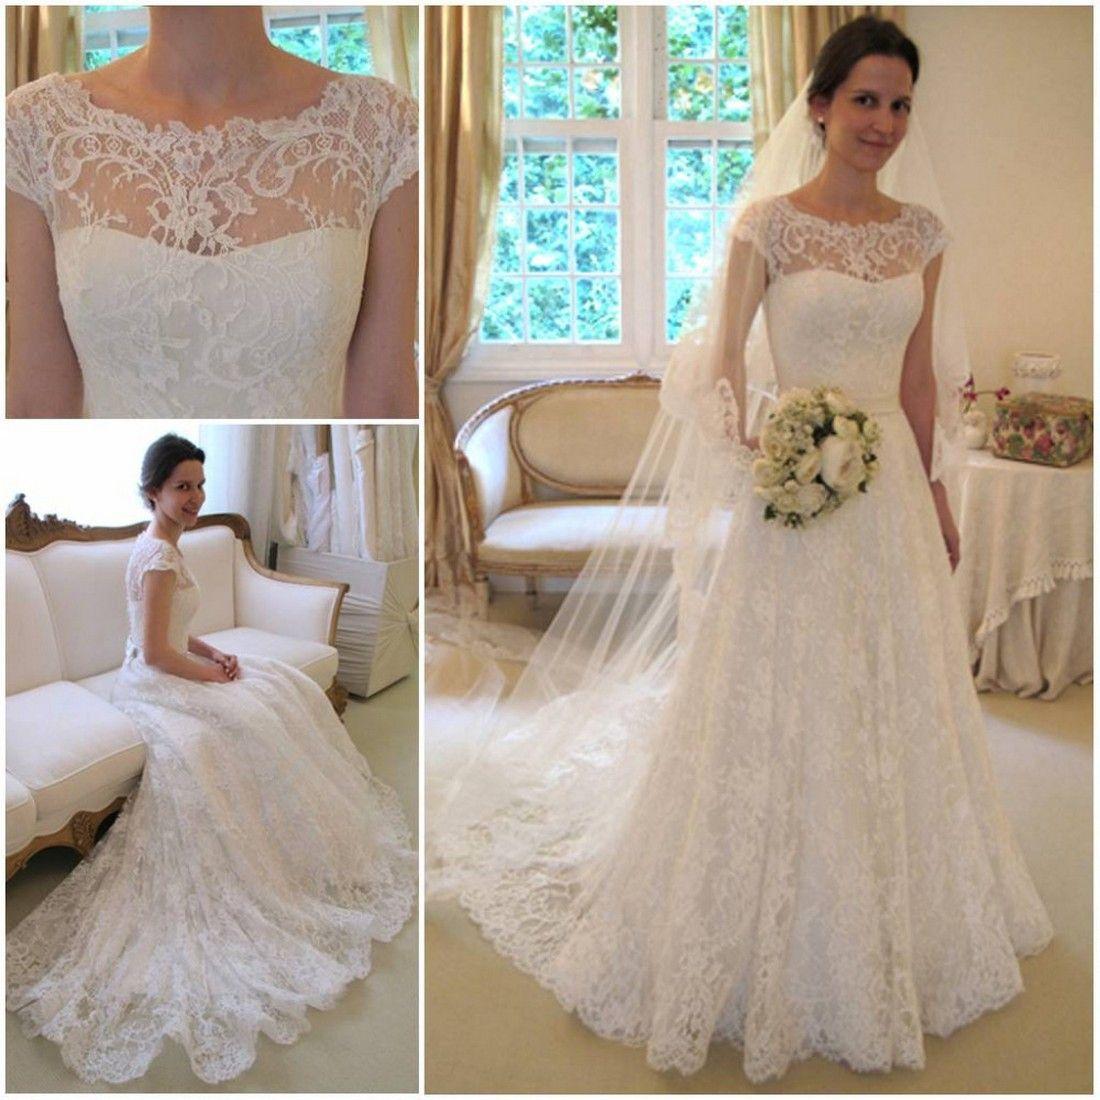 Pin by tyra austin on stuff to buy pinterest wedding dresses